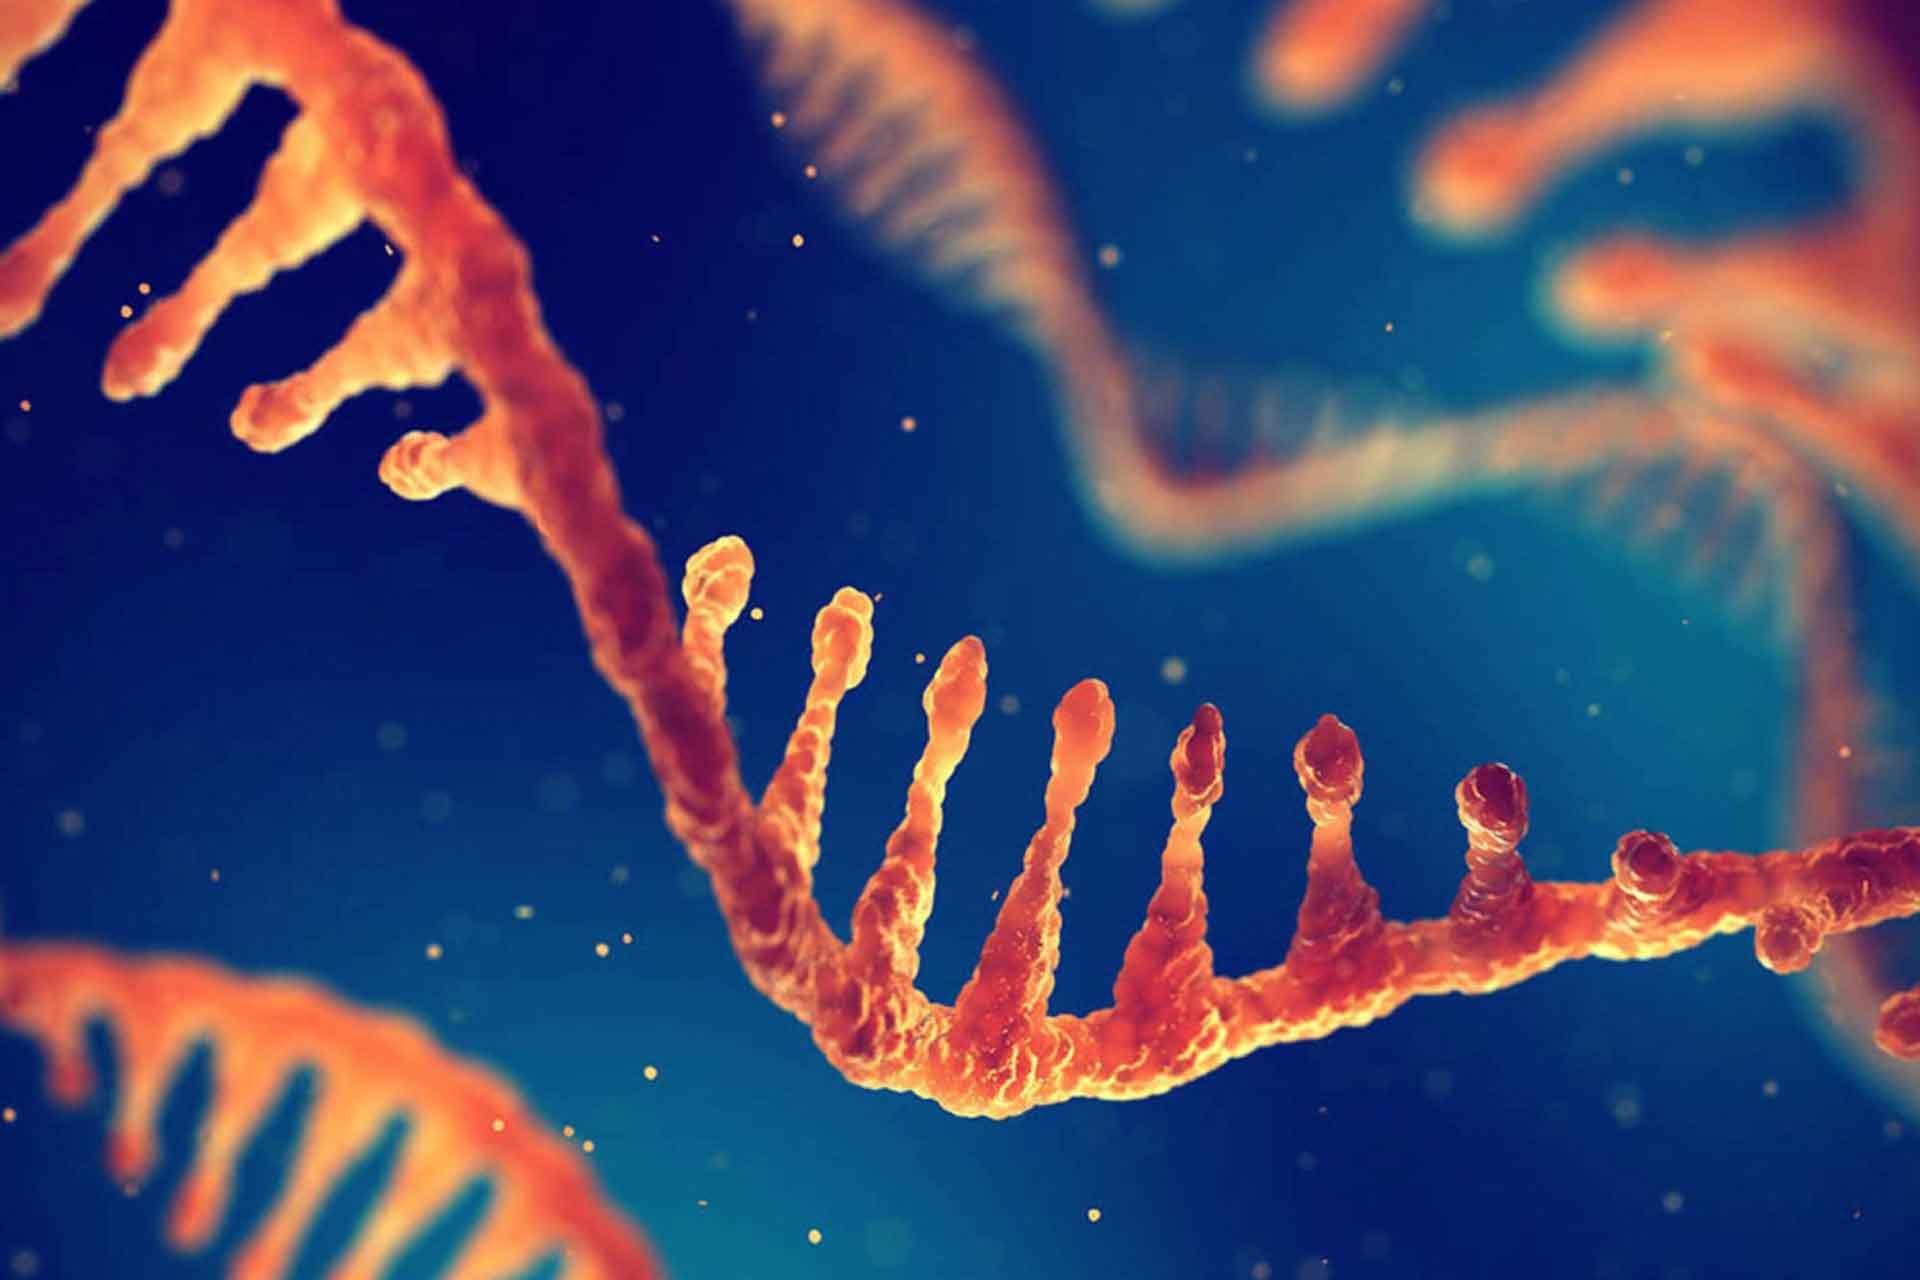 Definizione di mRNA